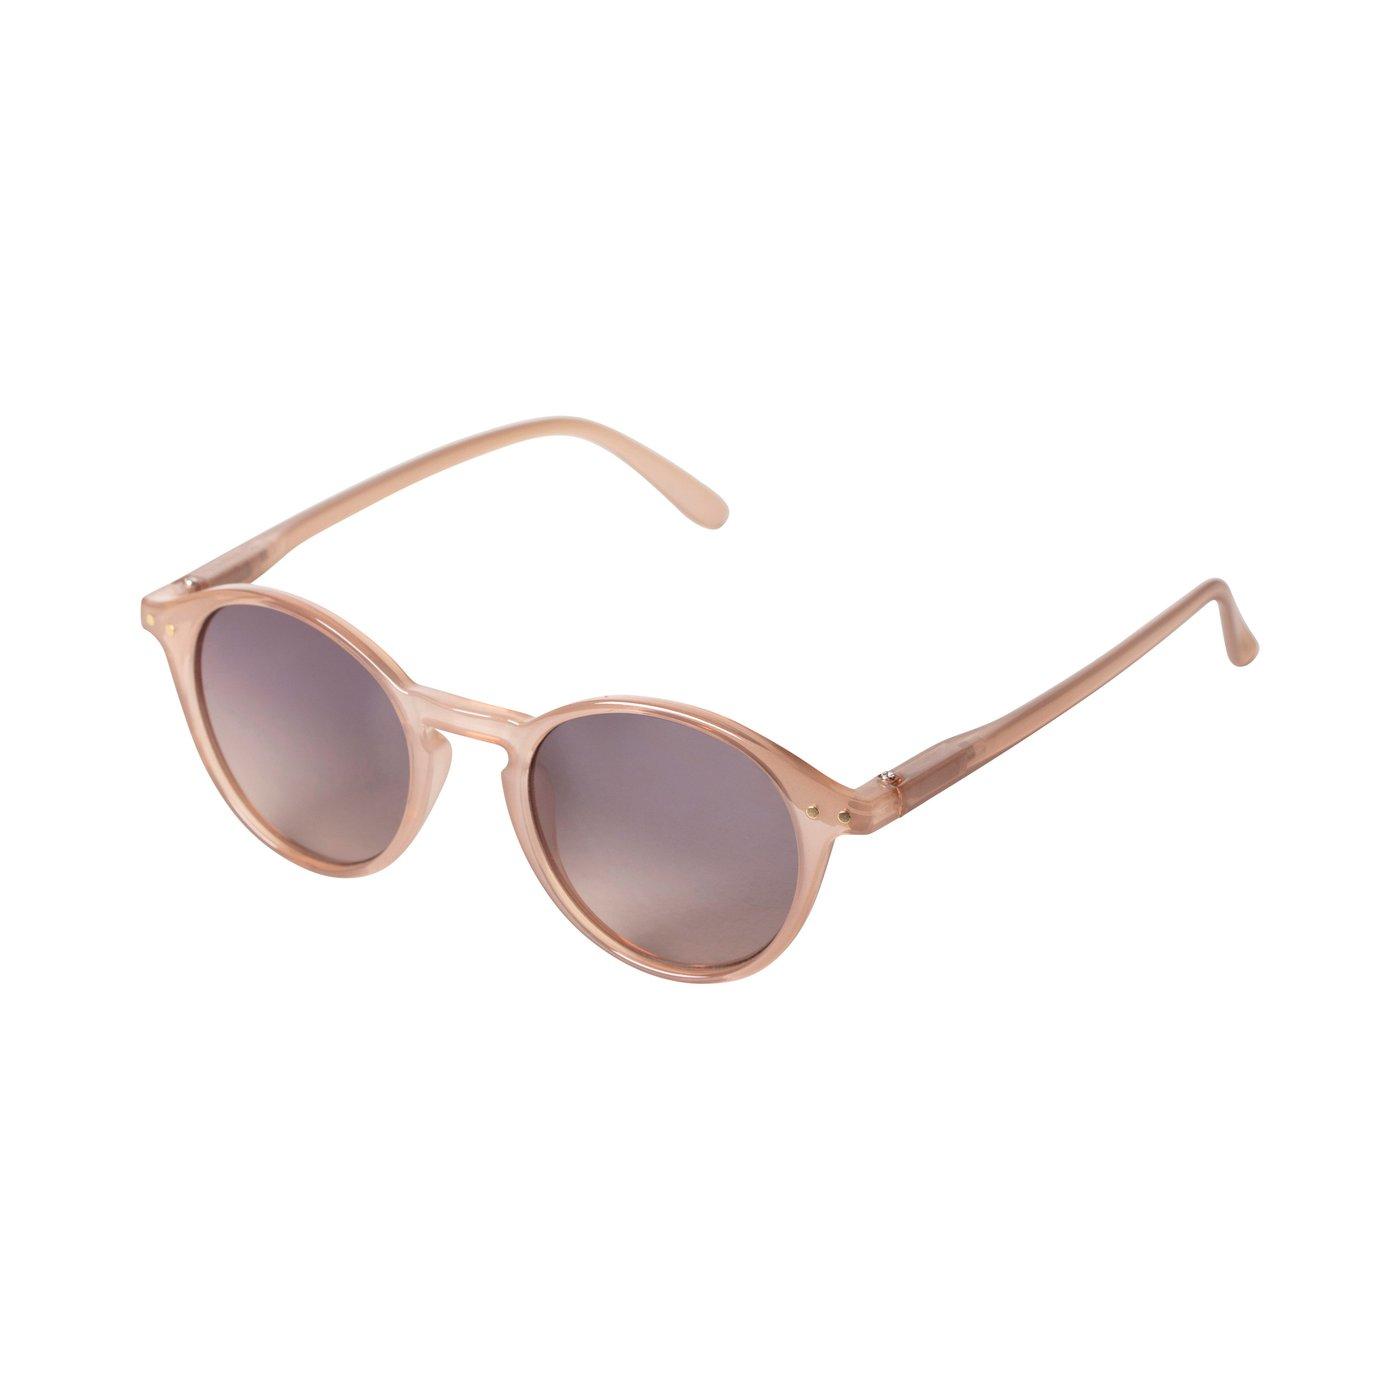 Roxanne Sunglasses Nude